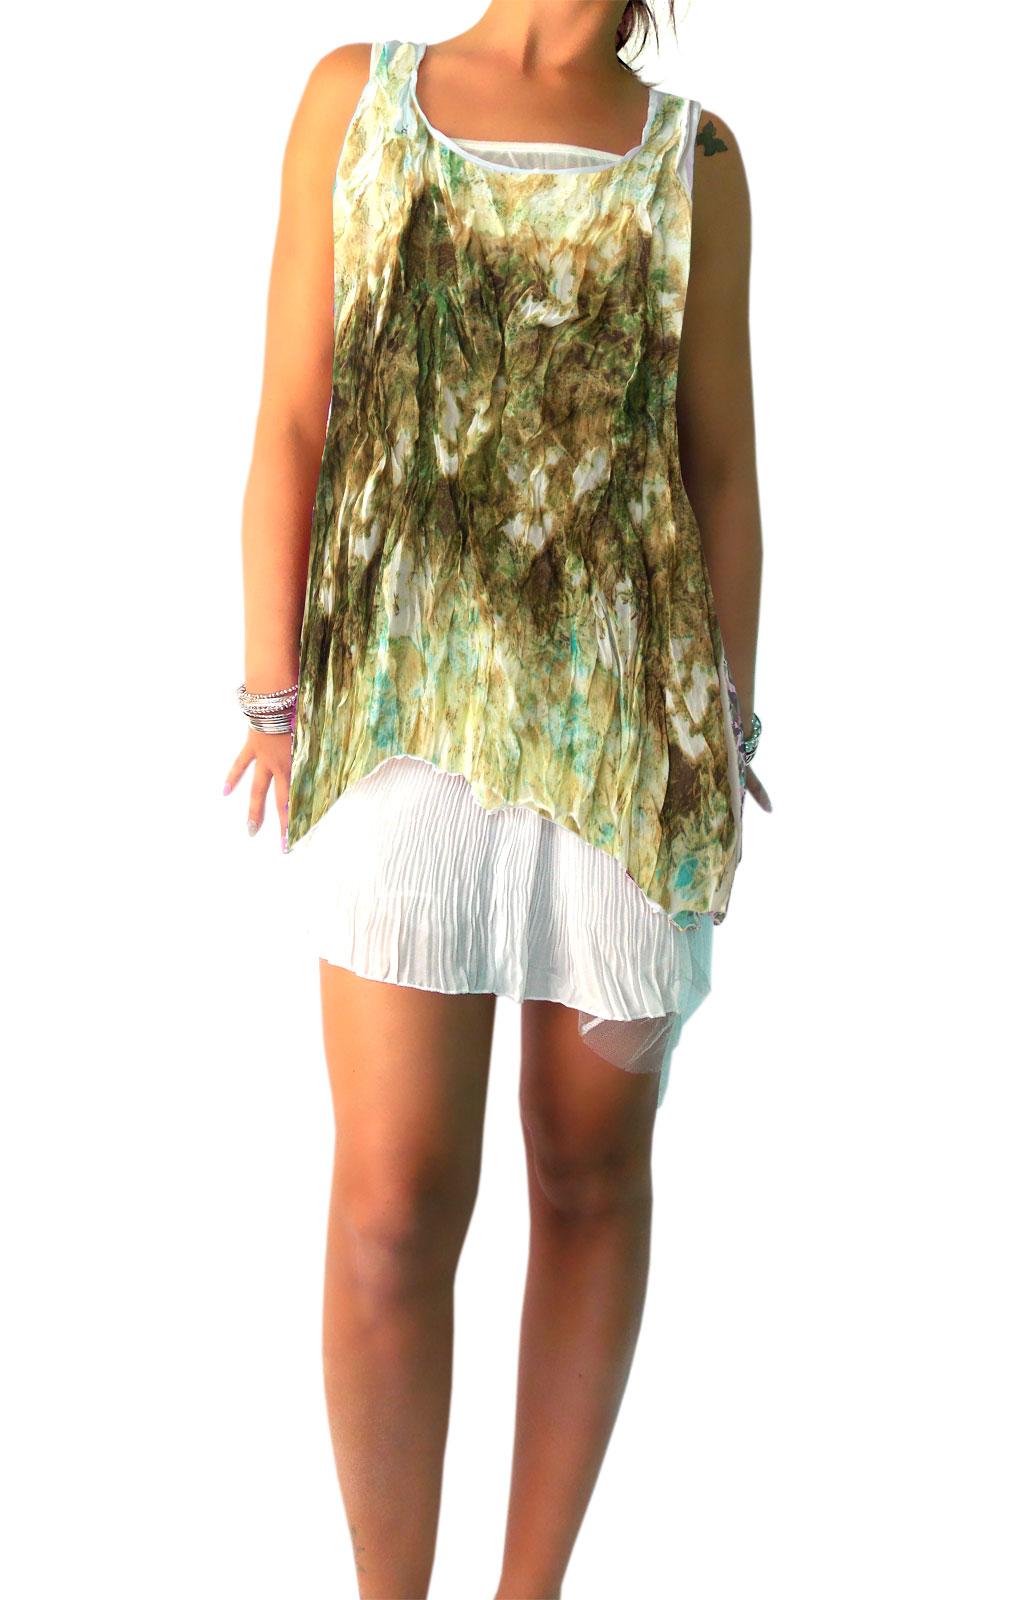 Damen Romantik Minikleider Nostalgie Knitteroptik geblümt mit Tüll  Unterkleid (15 Teilig)